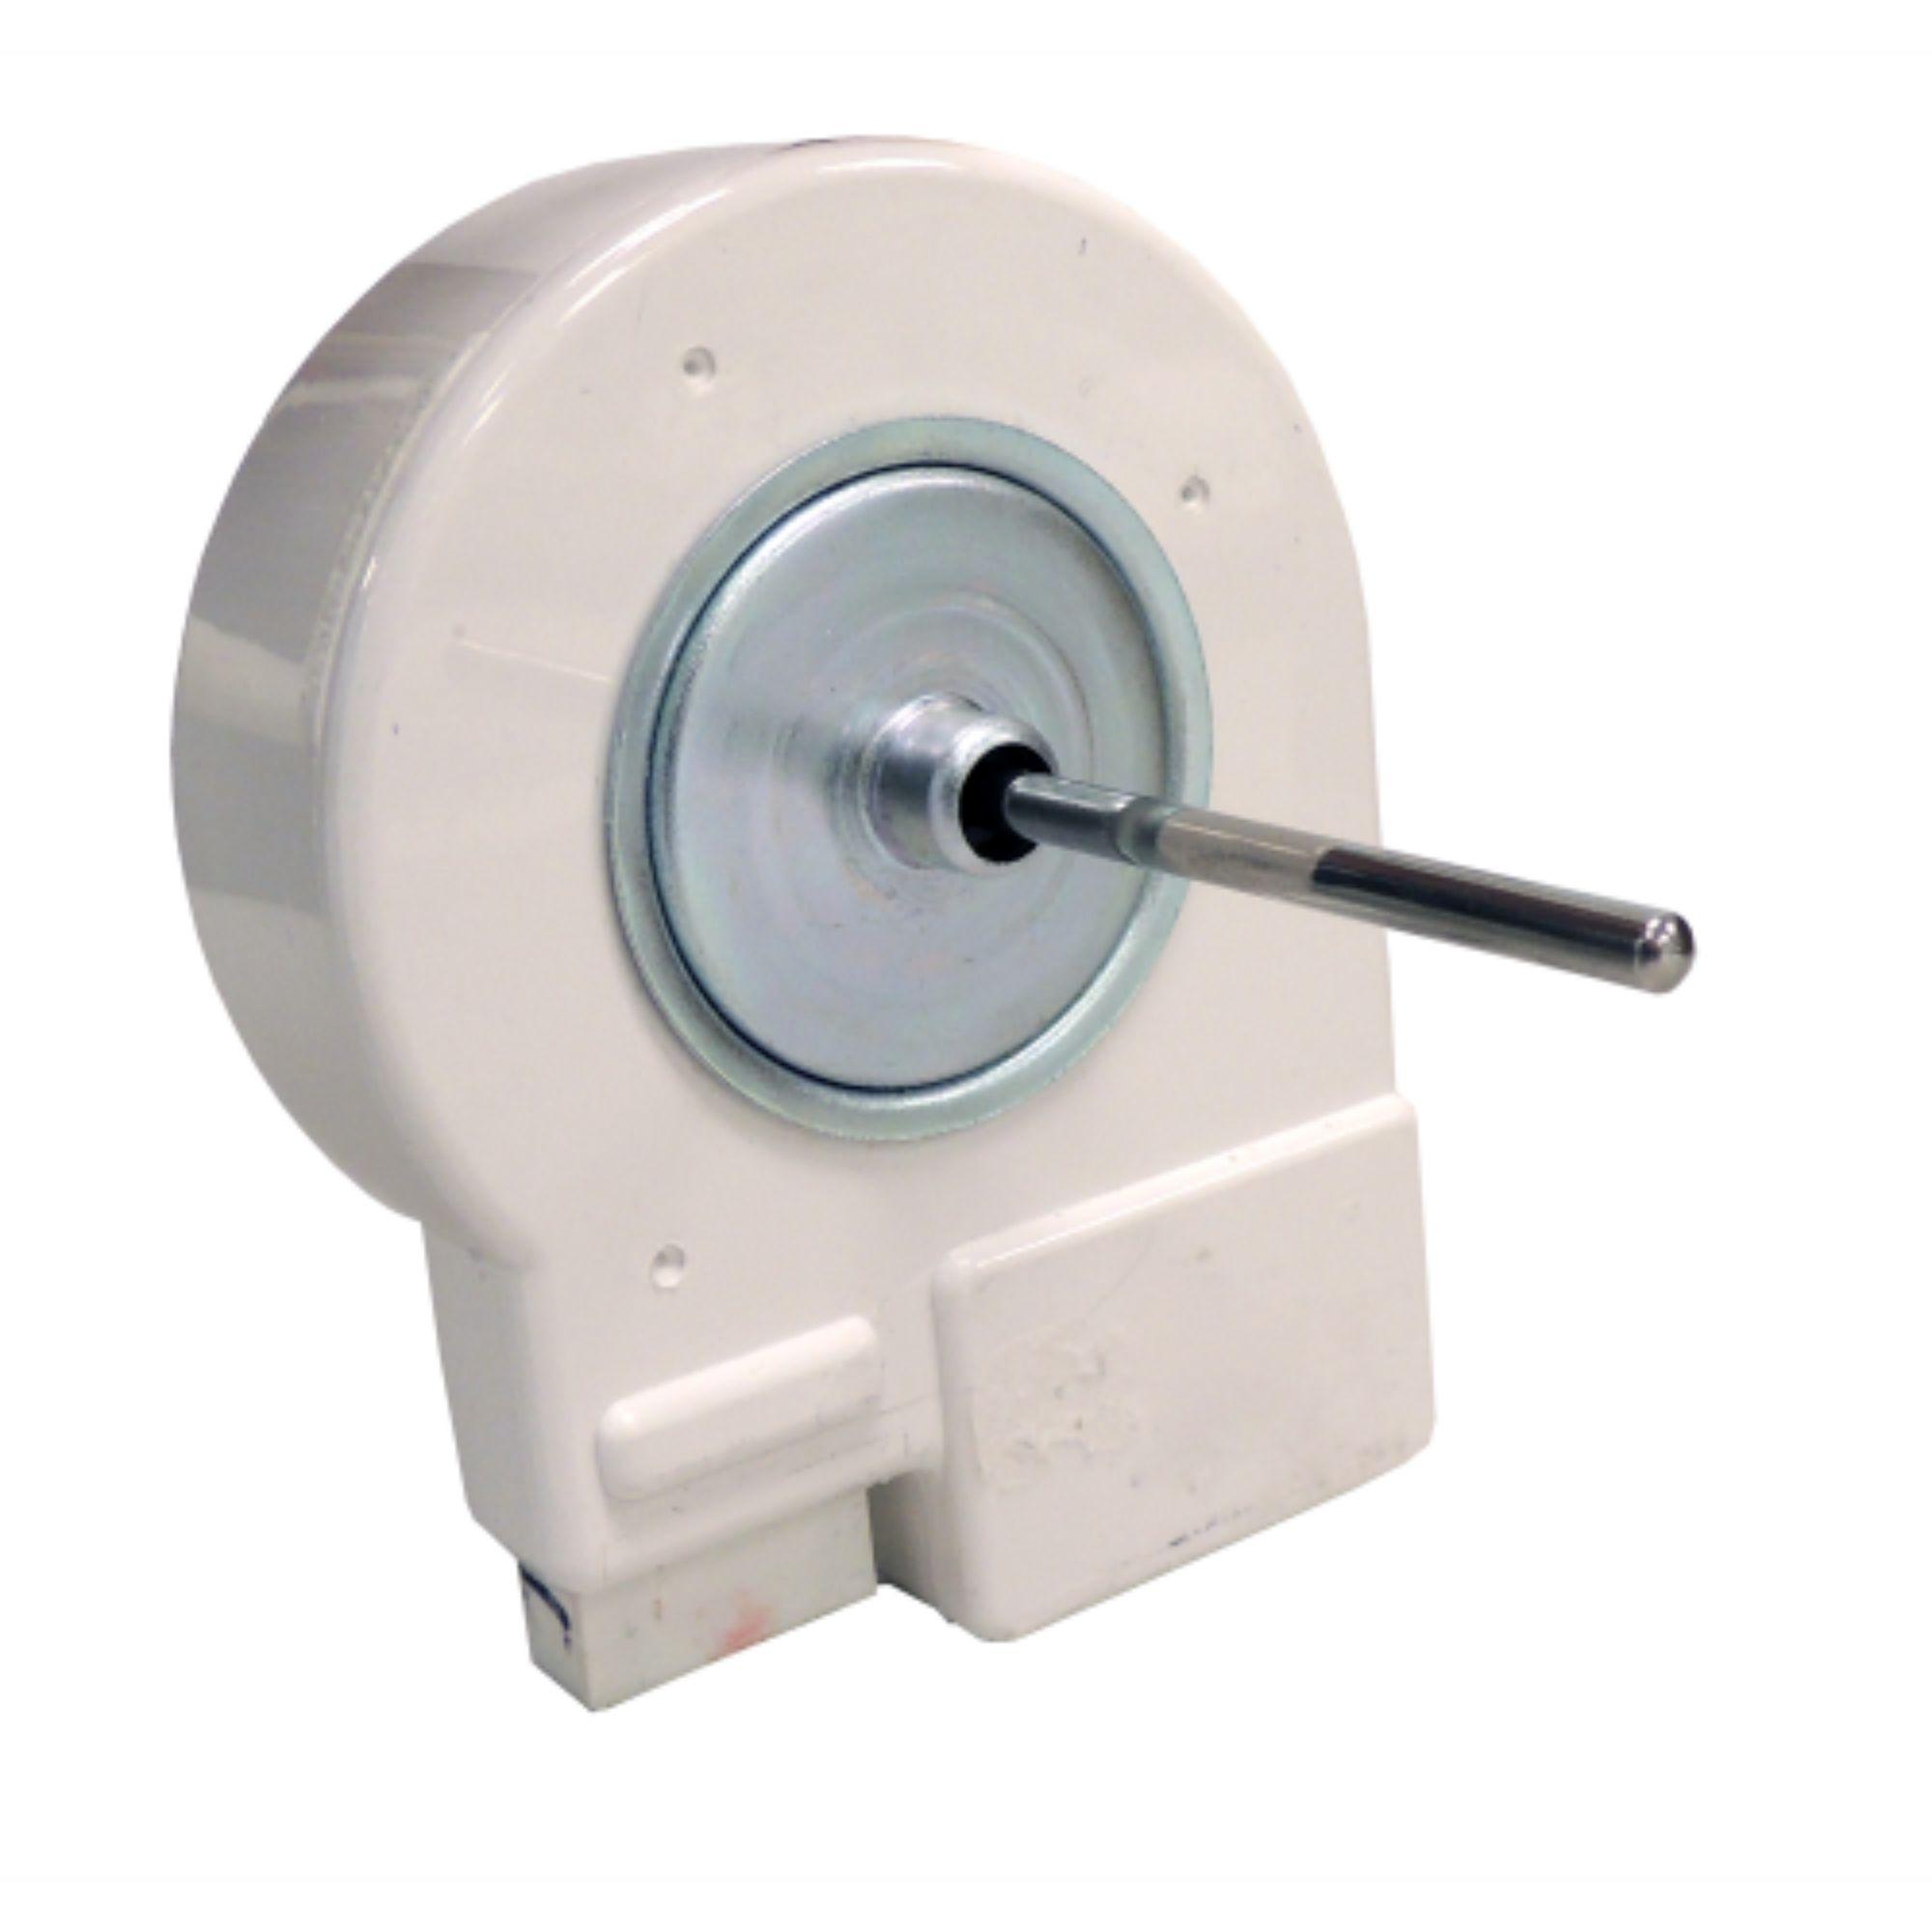 Sm0146e genuine oem supco evaporator fan motor ebay for Samsung refrigerator condenser fan motor